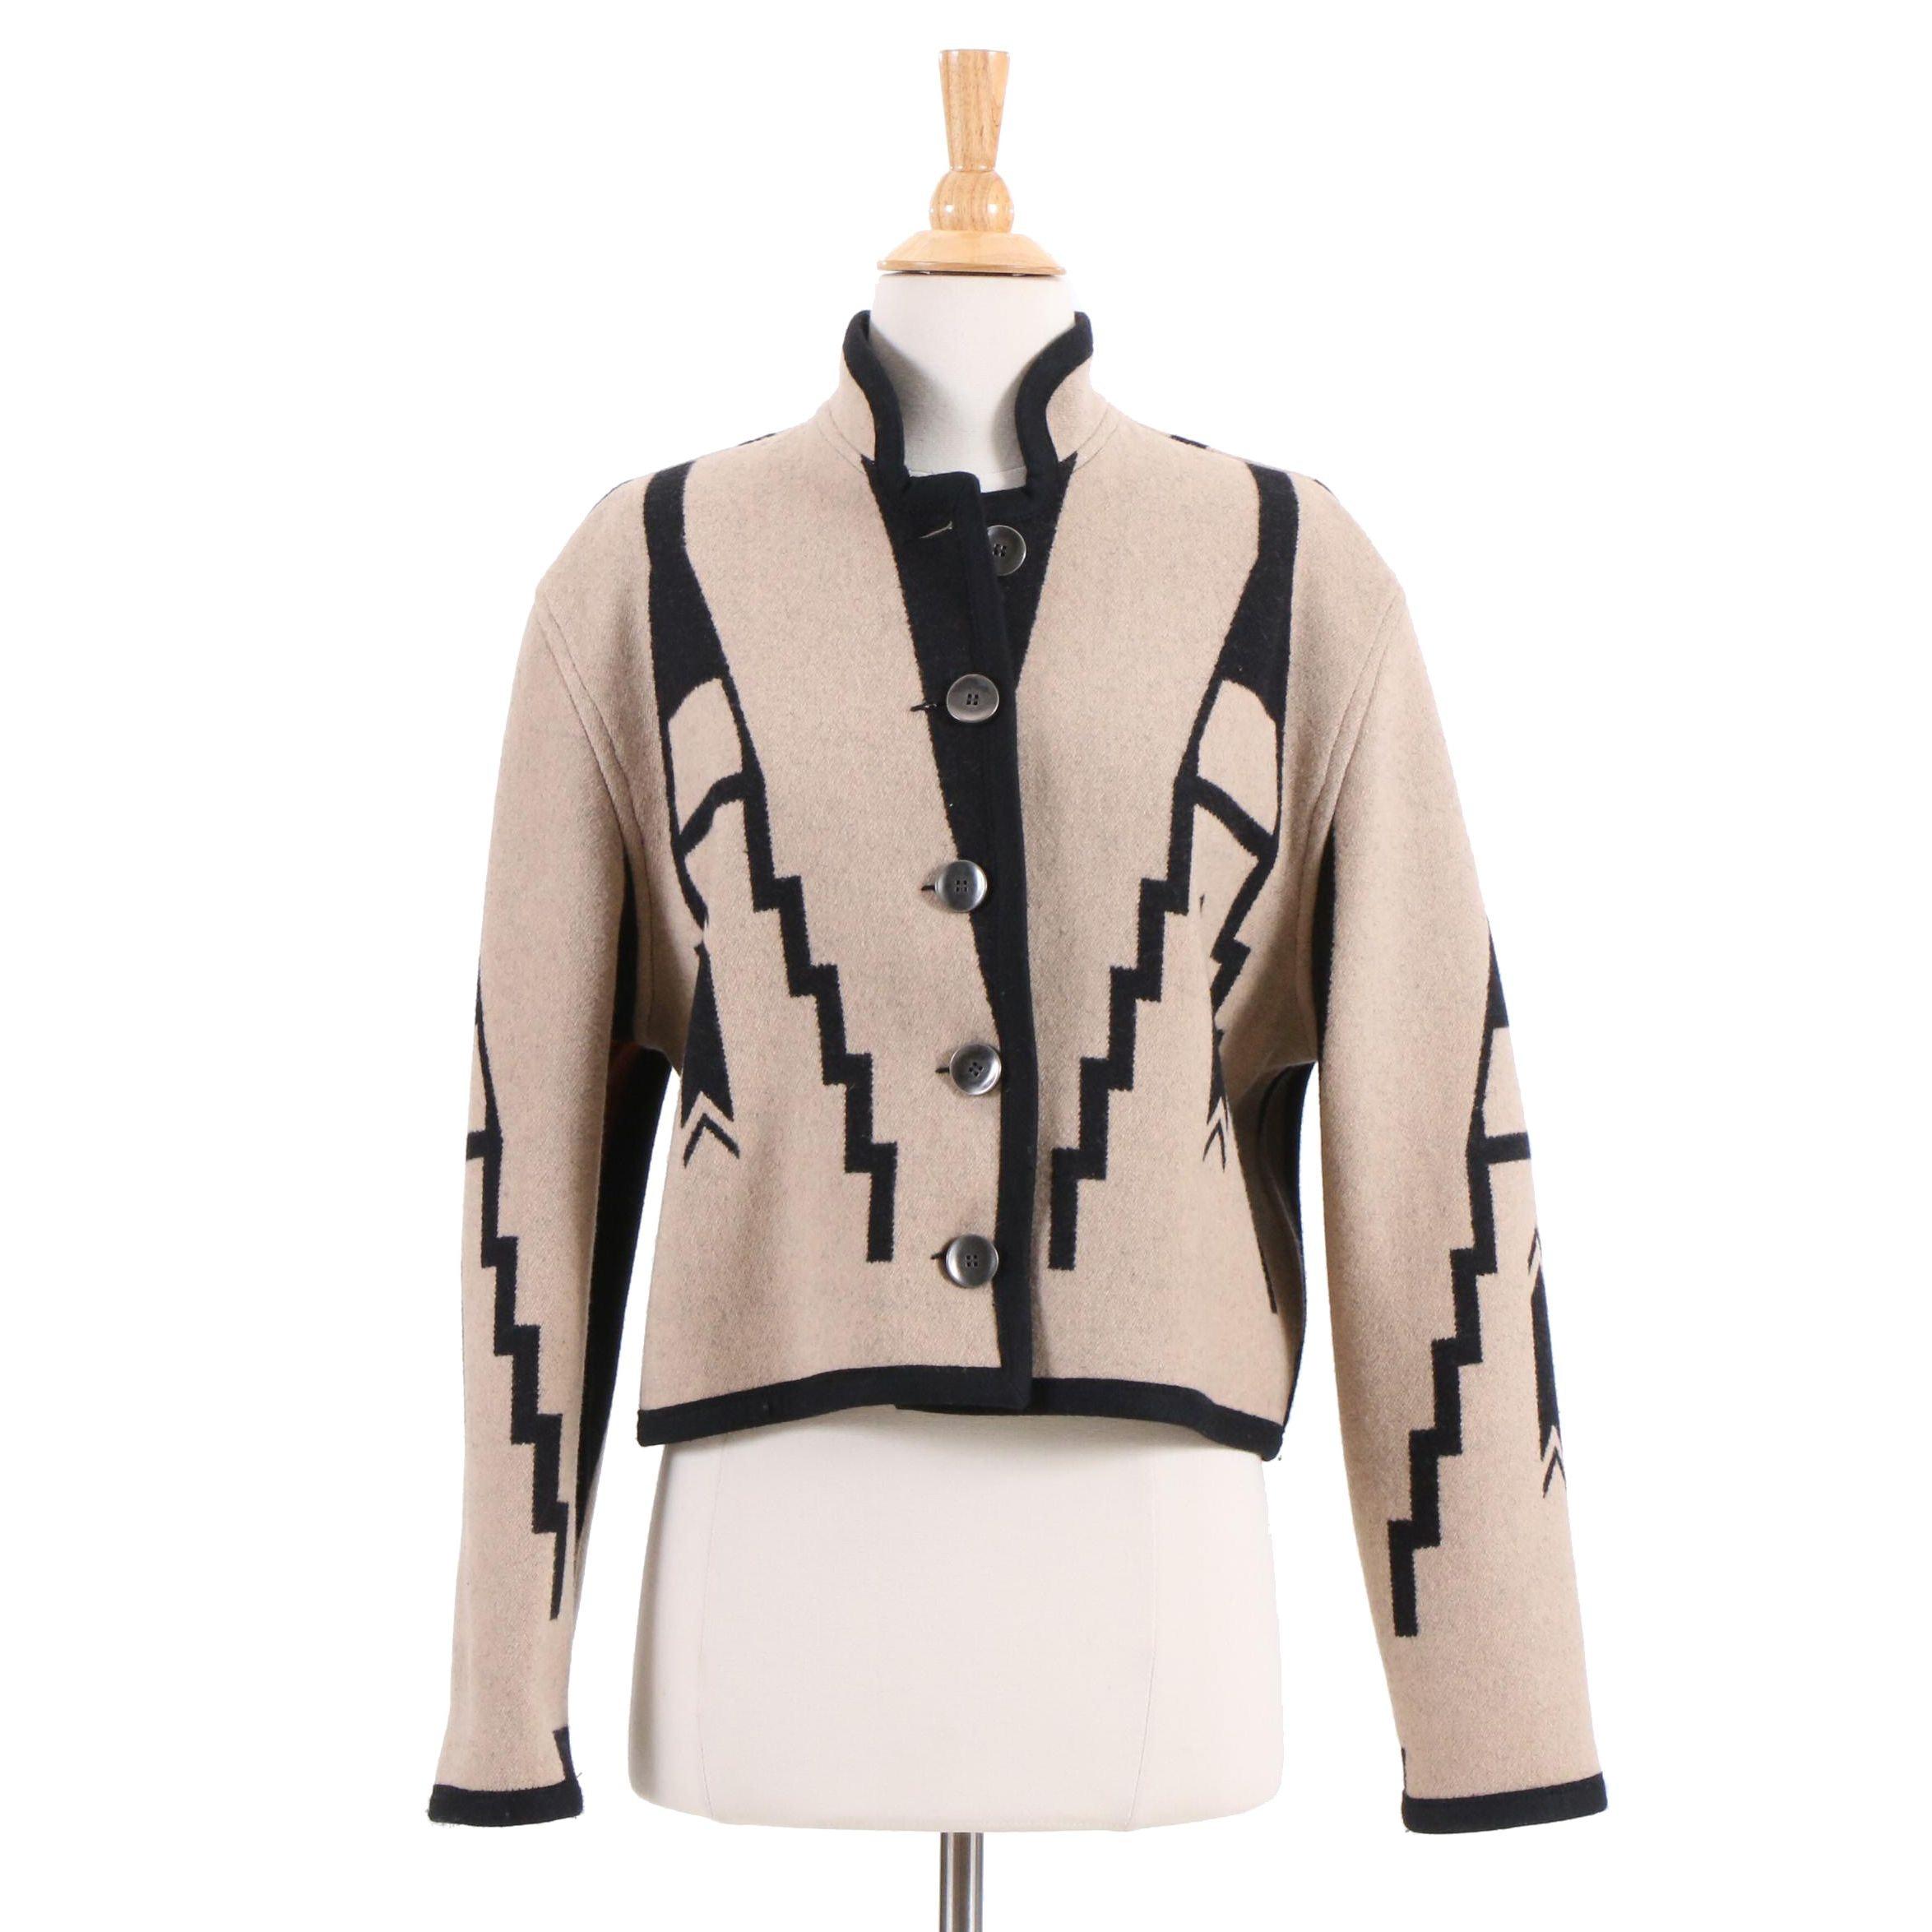 Pendleton Reversible Navajo Print Wool Jacket, Vintage